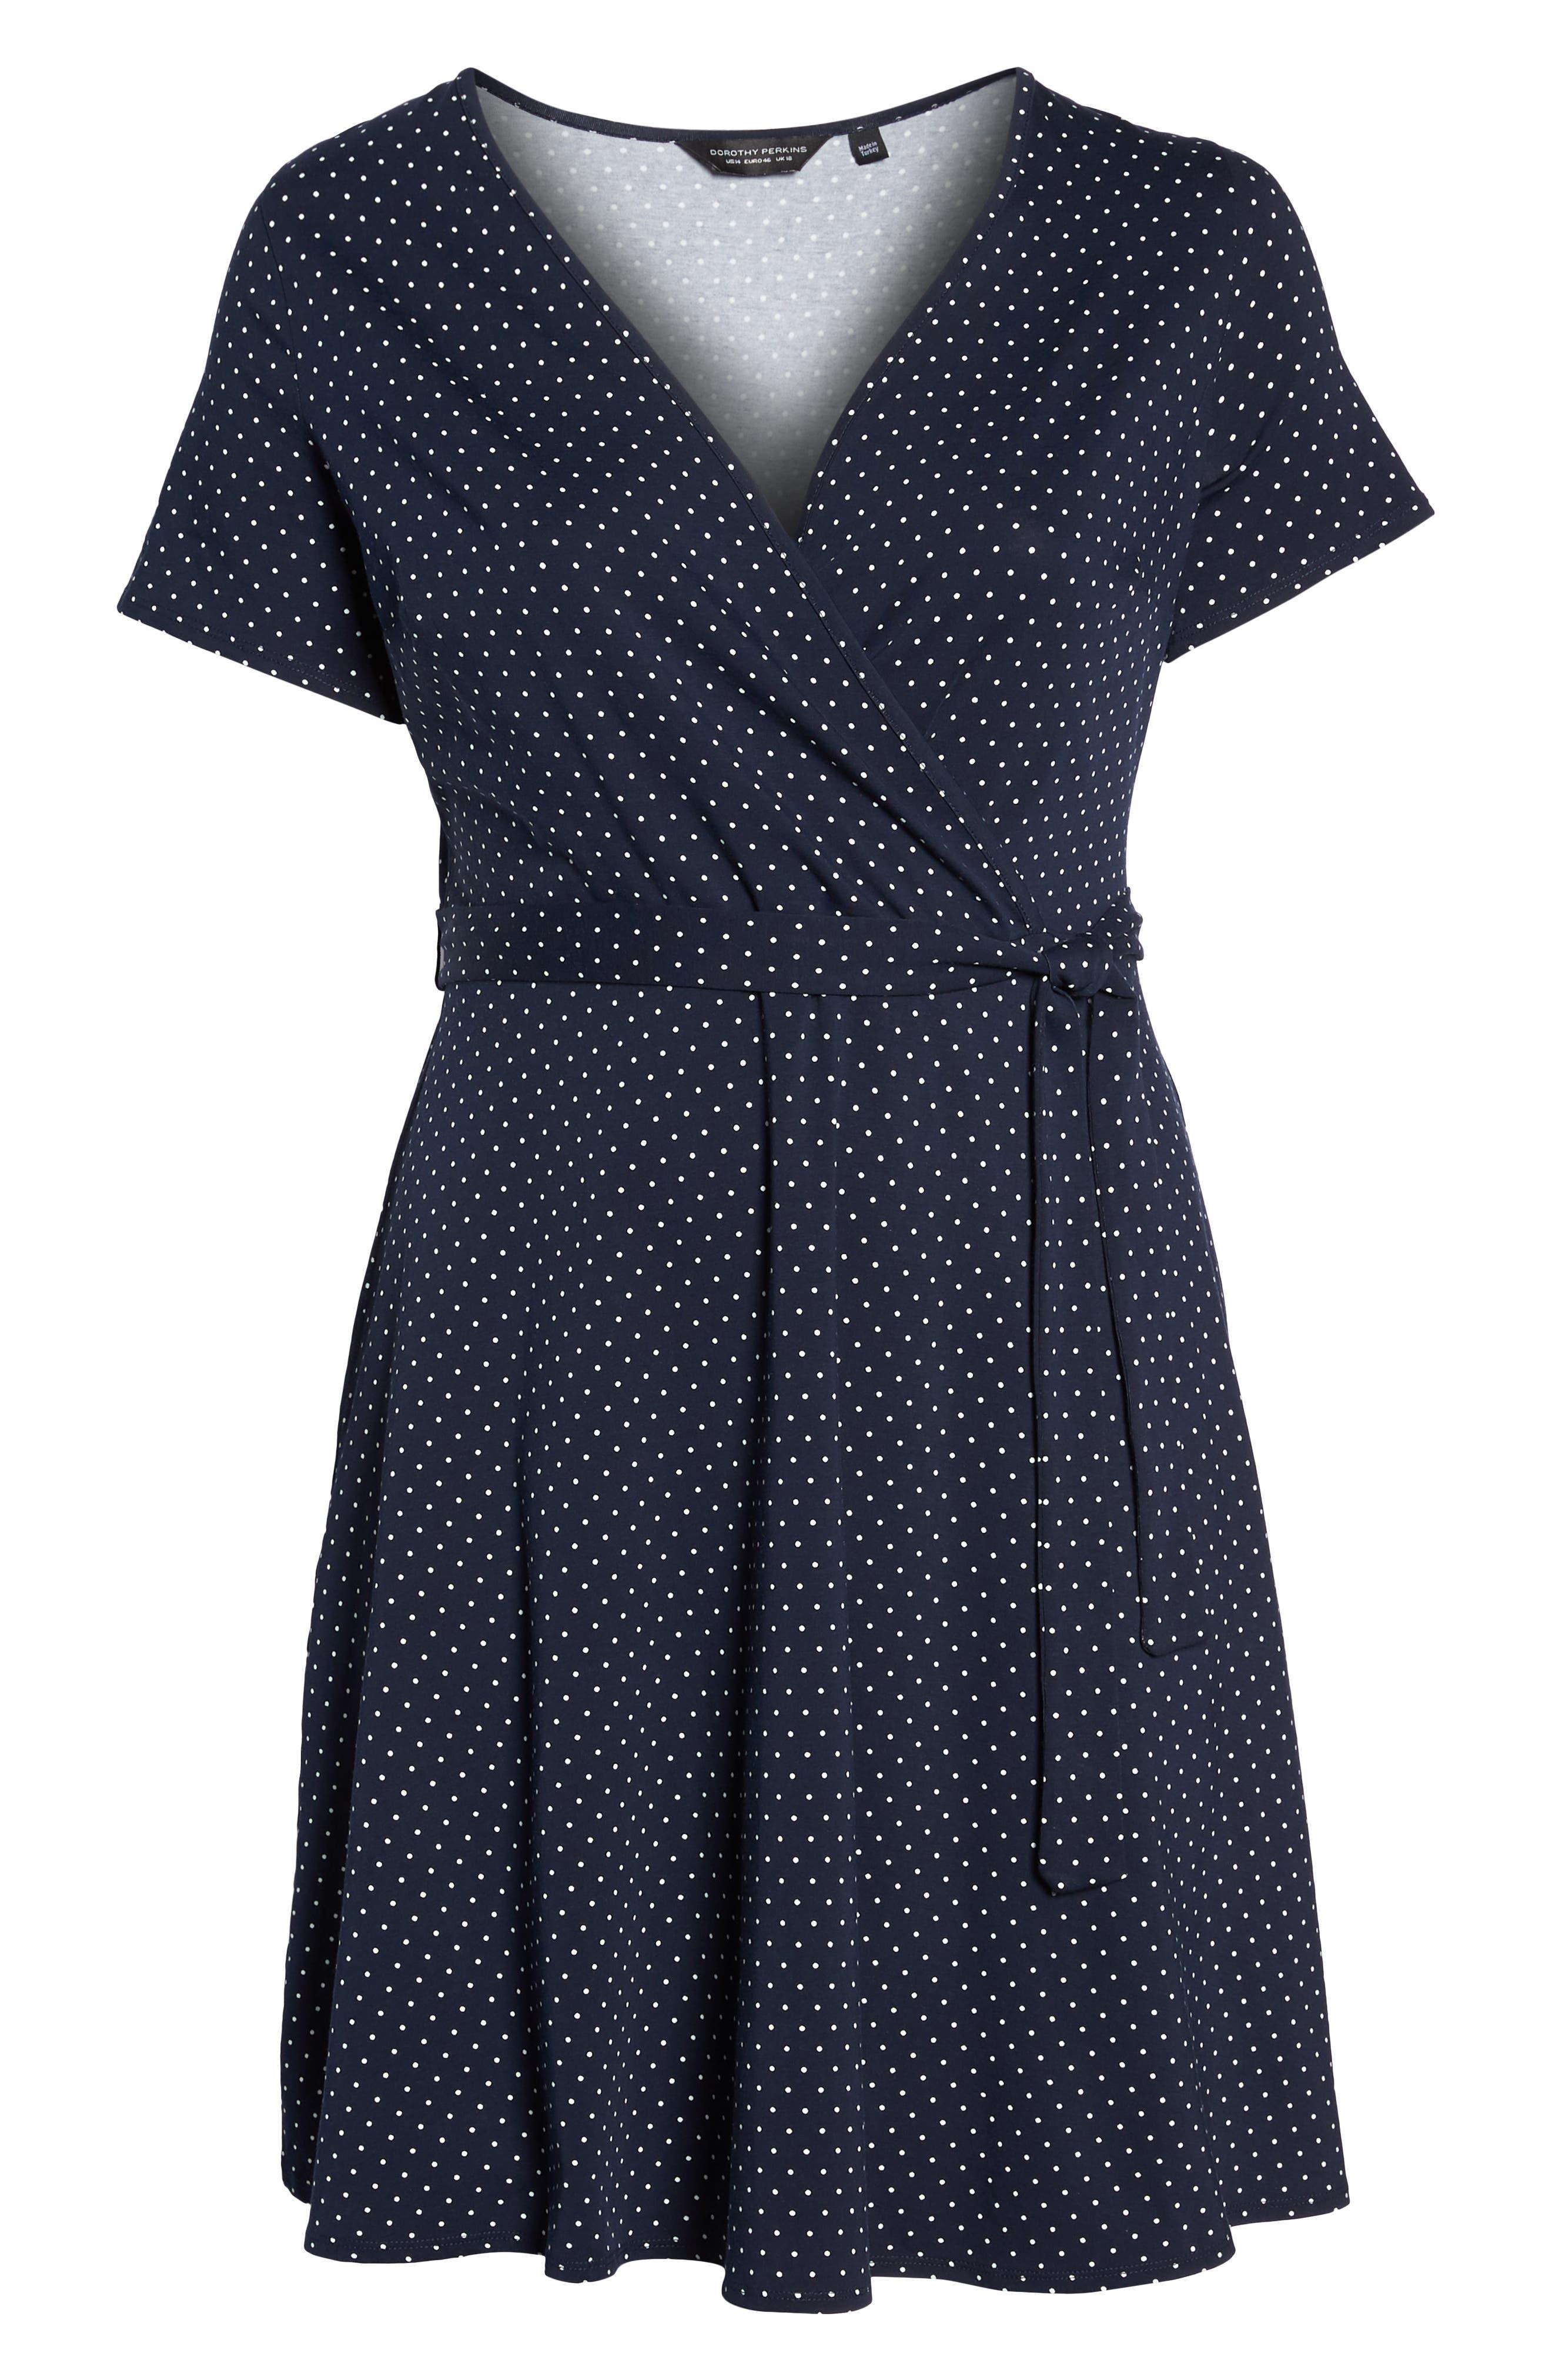 Spot Fit & Flare Wrap Dress,                             Alternate thumbnail 7, color,                             Navy